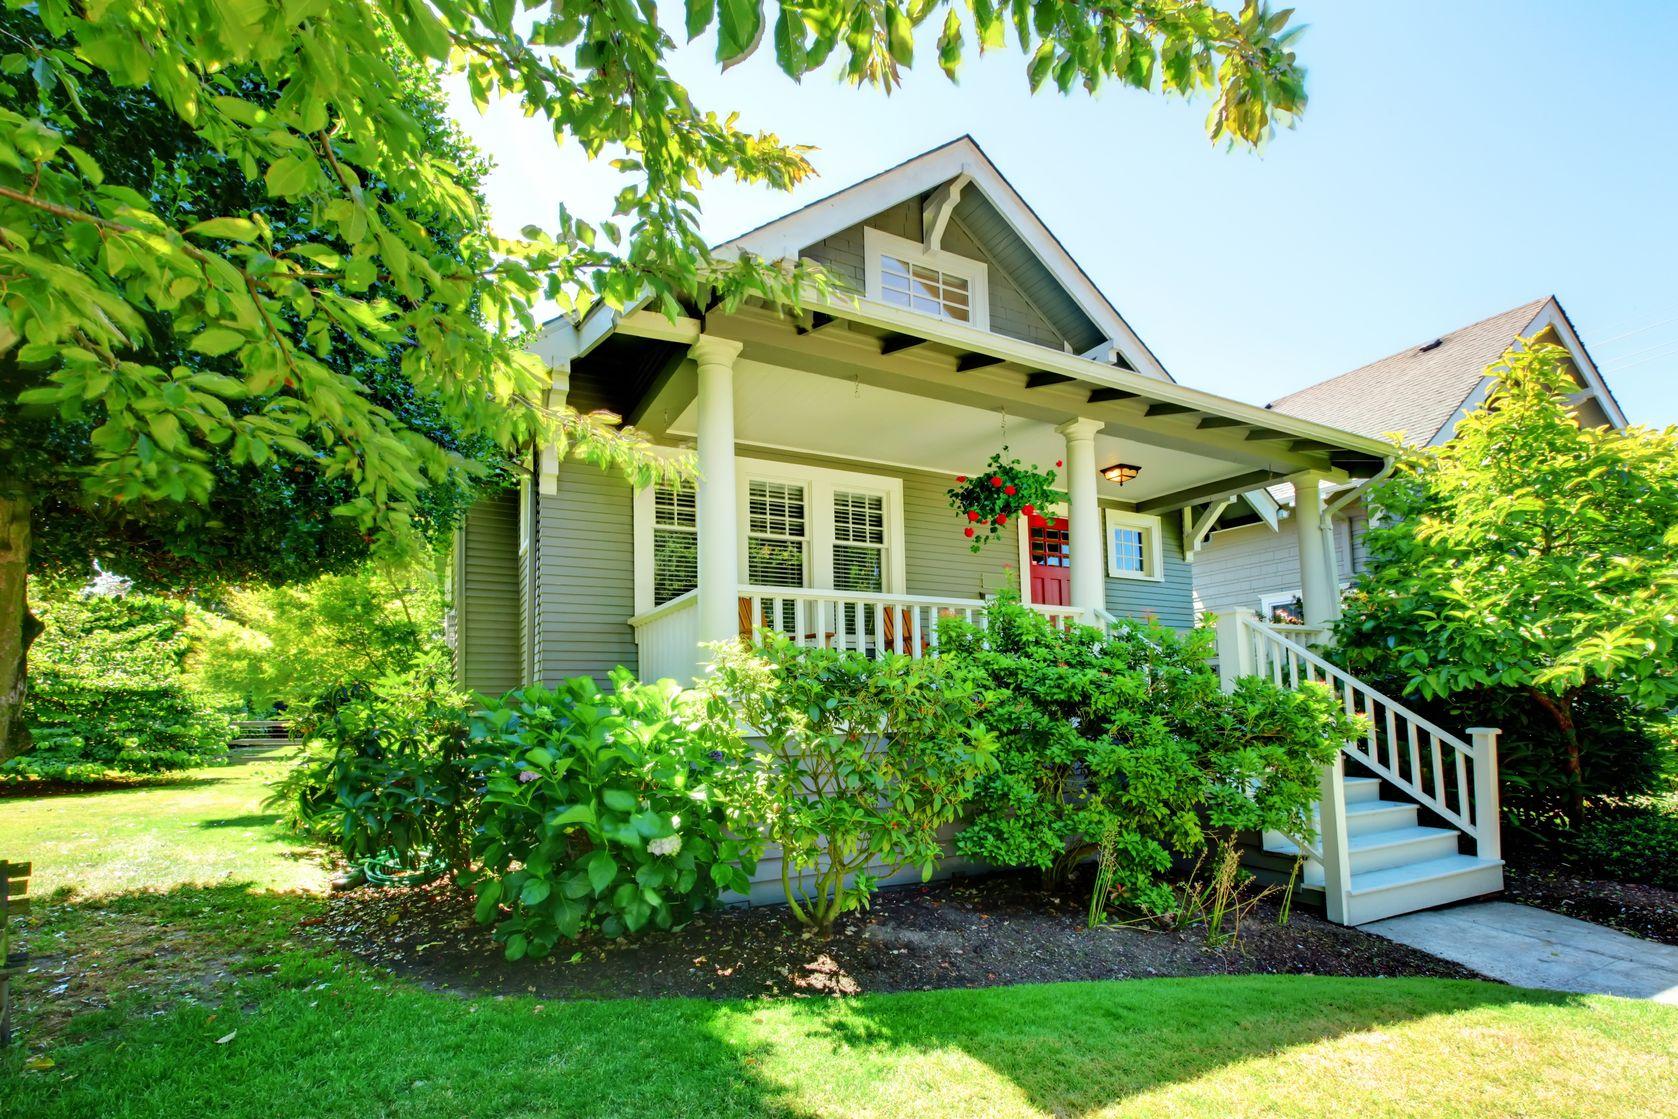 Region of Waterloo Affordable Home Ownership Program